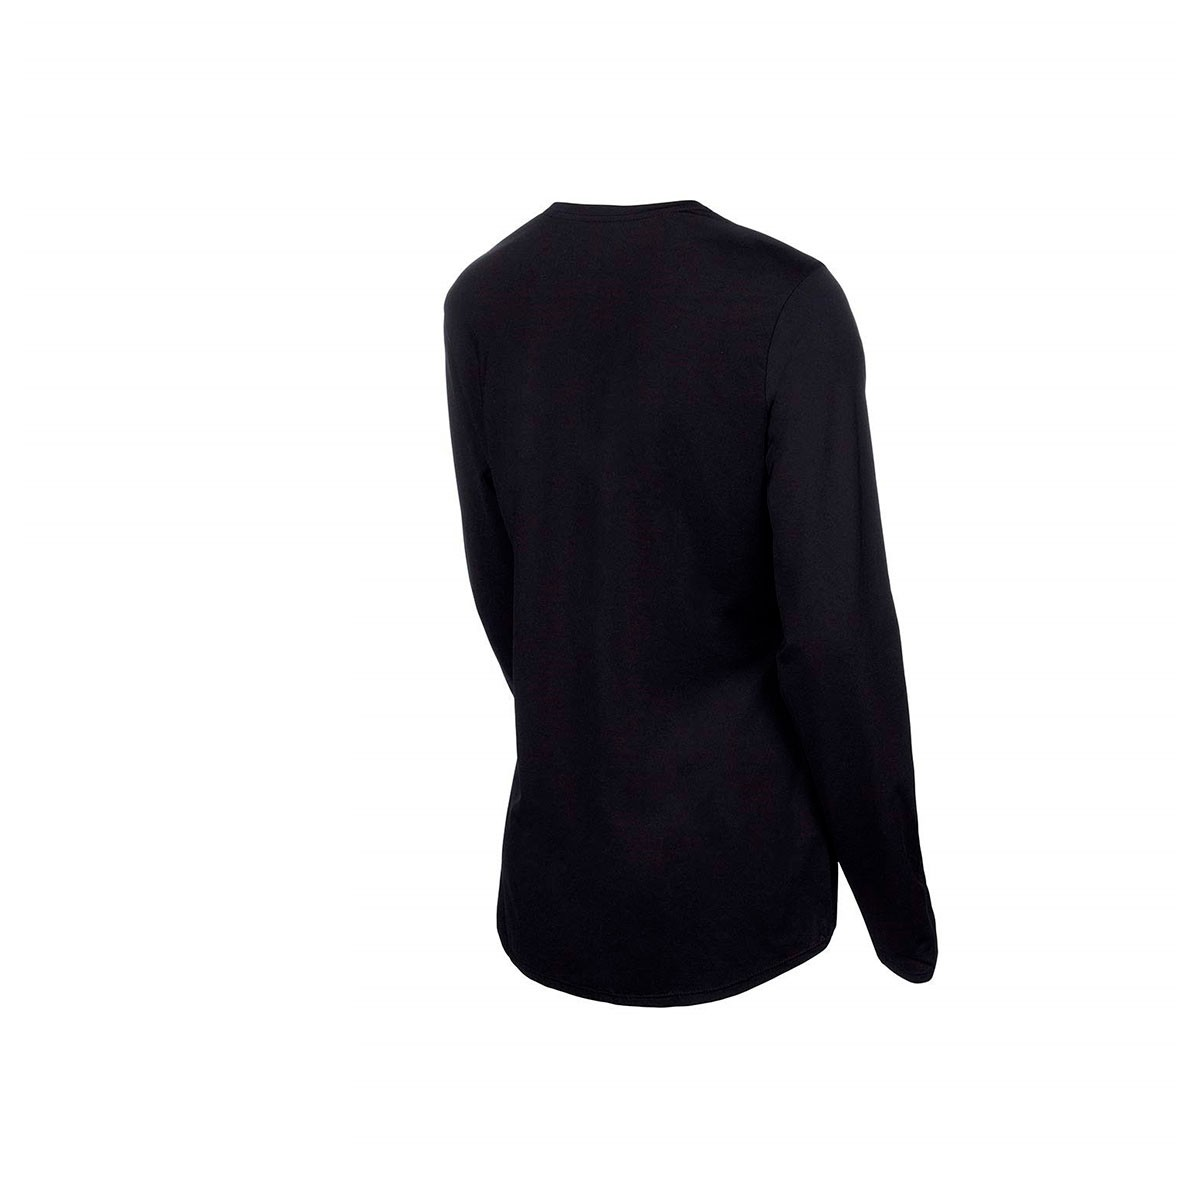 Camiseta Speedo UV Protection ML Feminino Preto